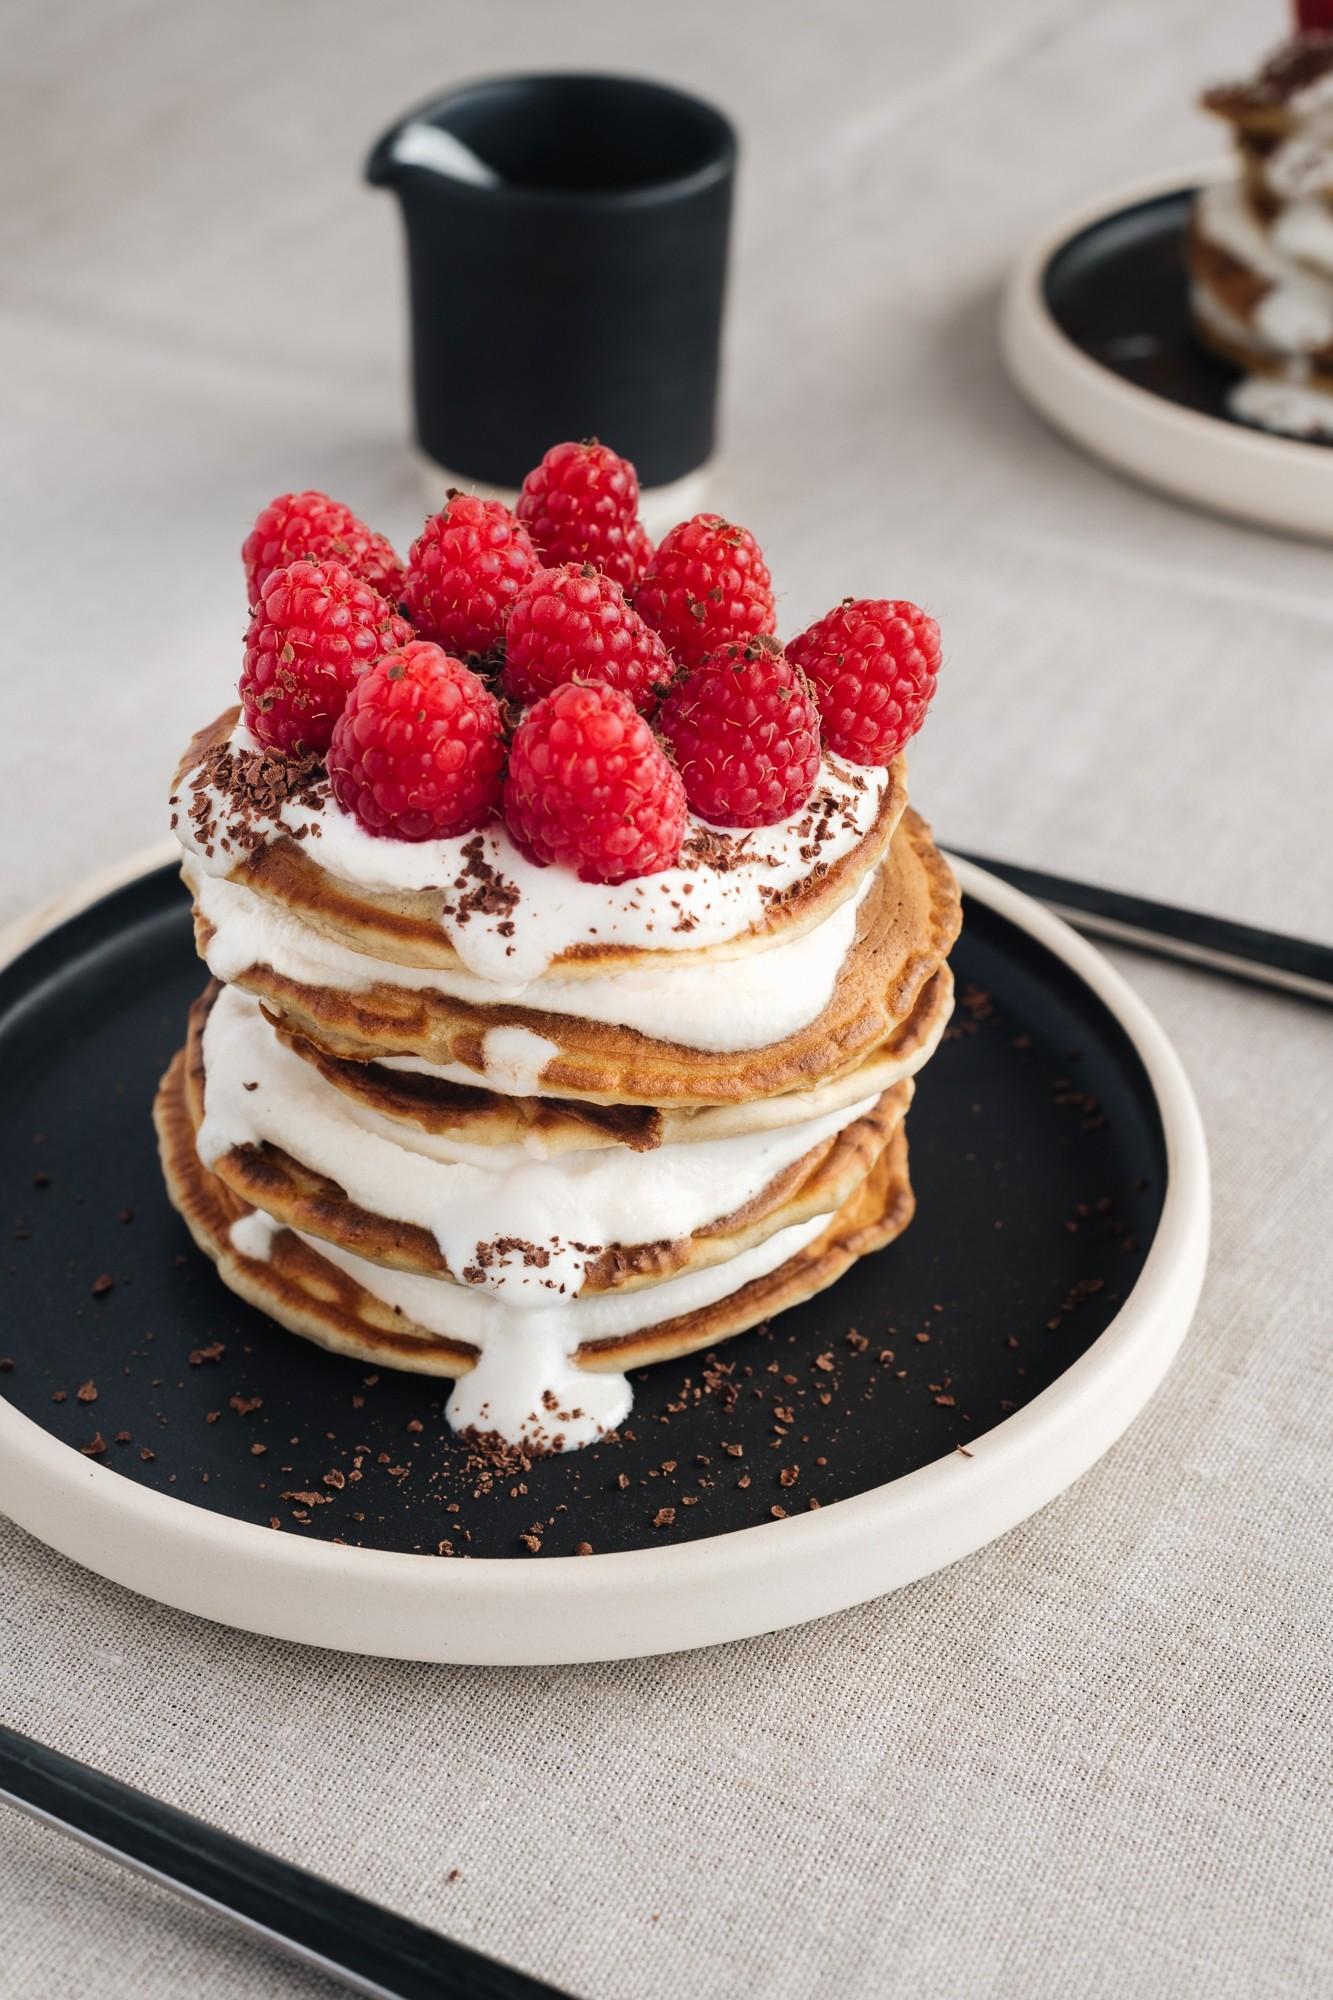 dsc 4839 2 - Gluten Free Fluffy Pancakes